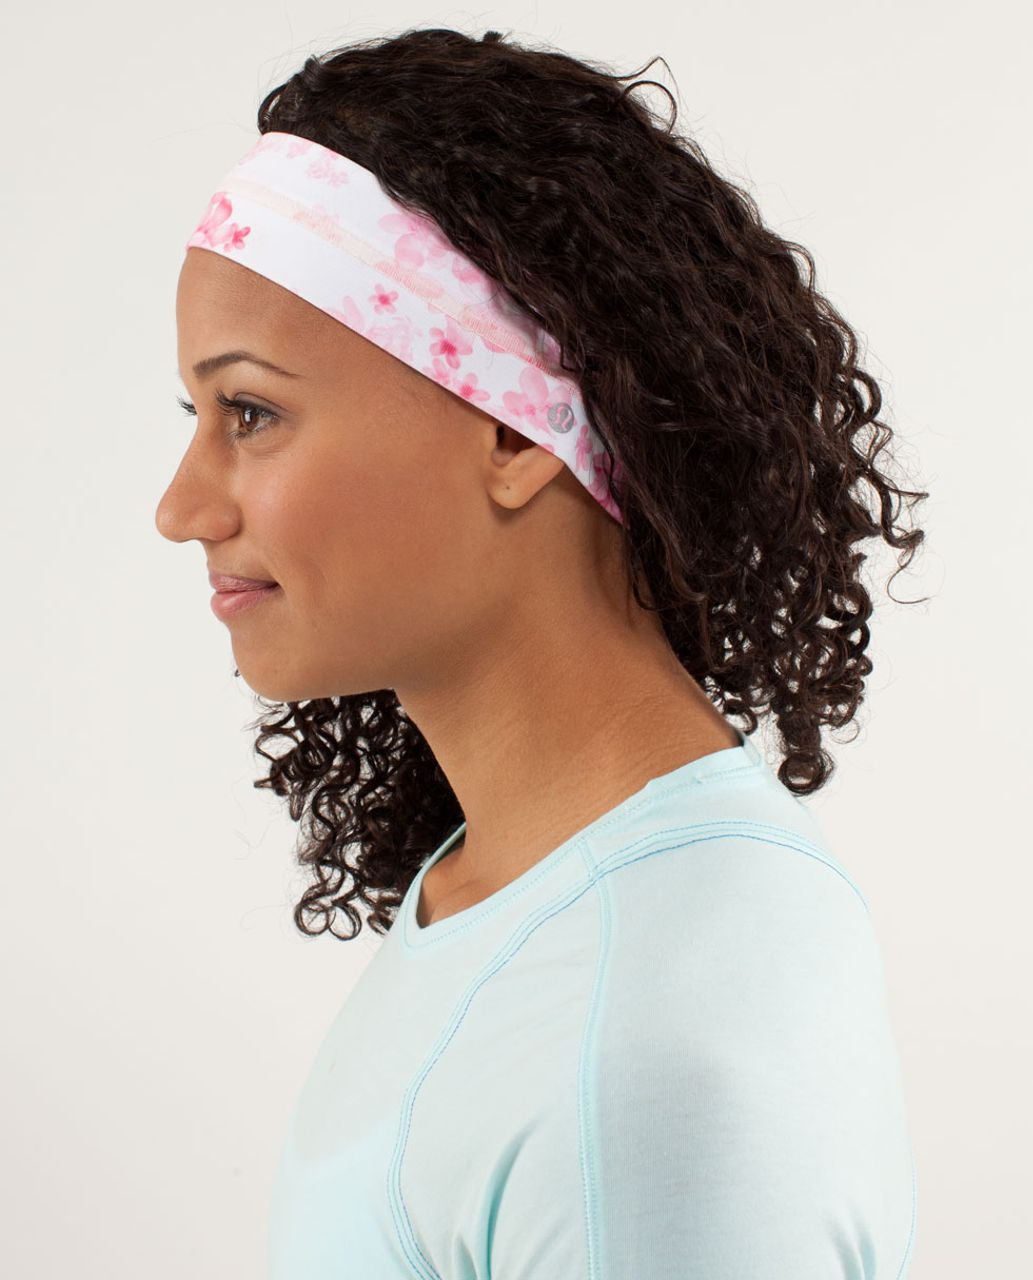 Lululemon Fly Away Tamer Headband - Frangipani Parfait Pink